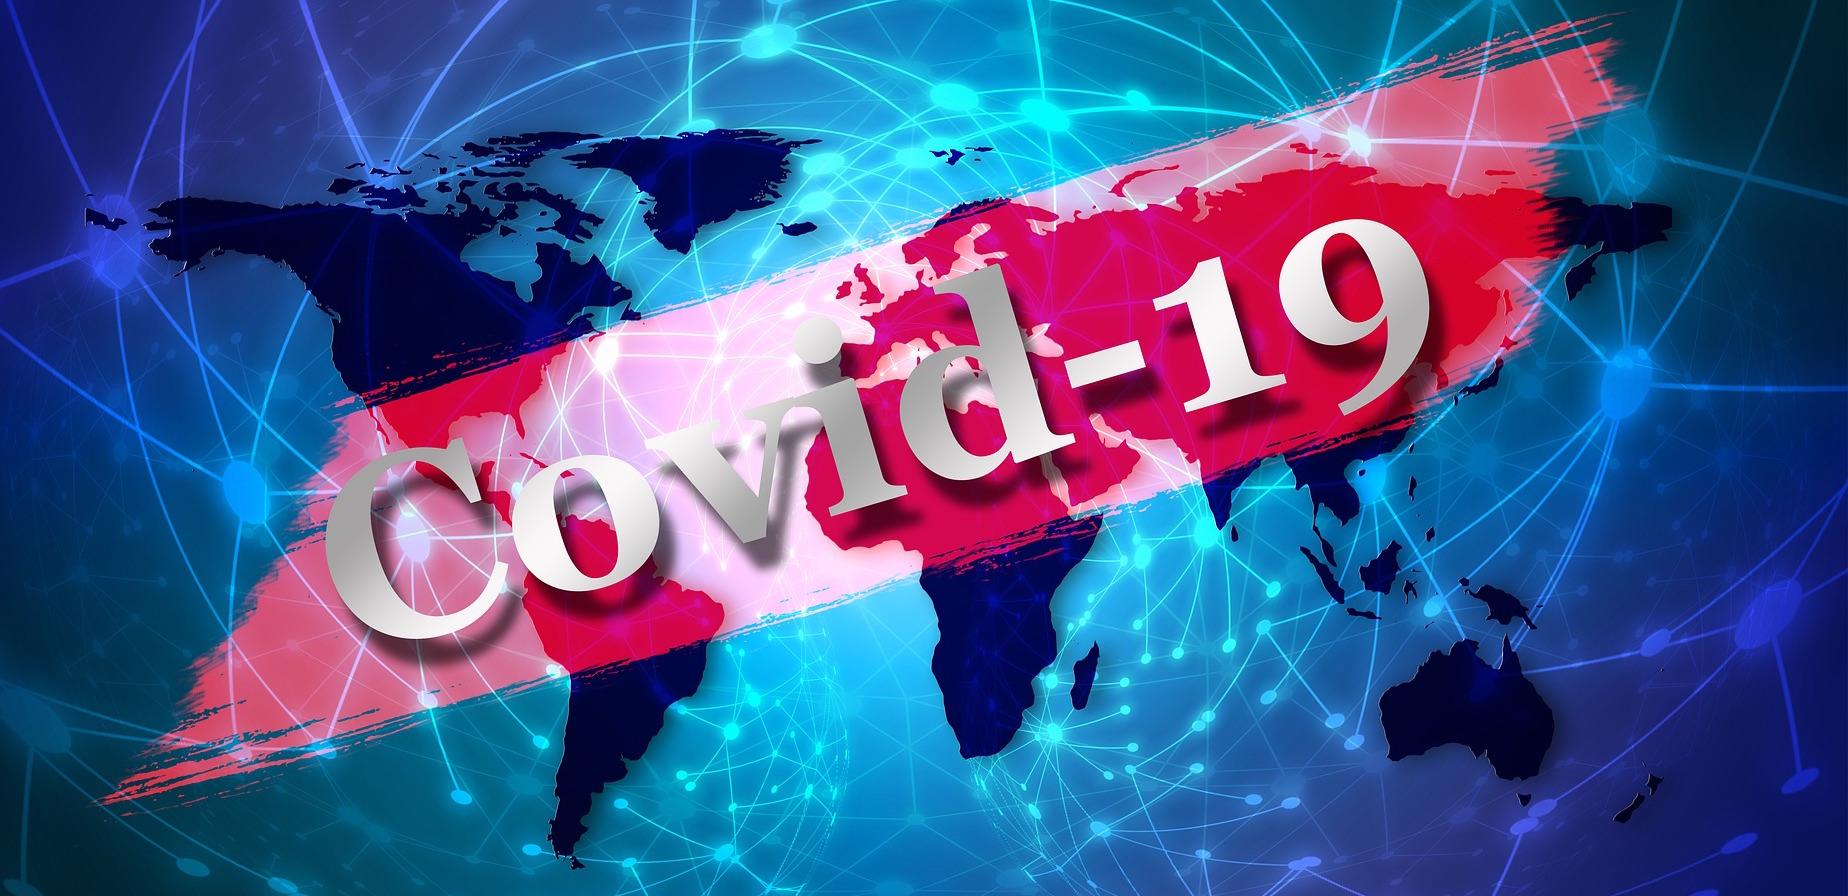 ASI's Covid-19 Response